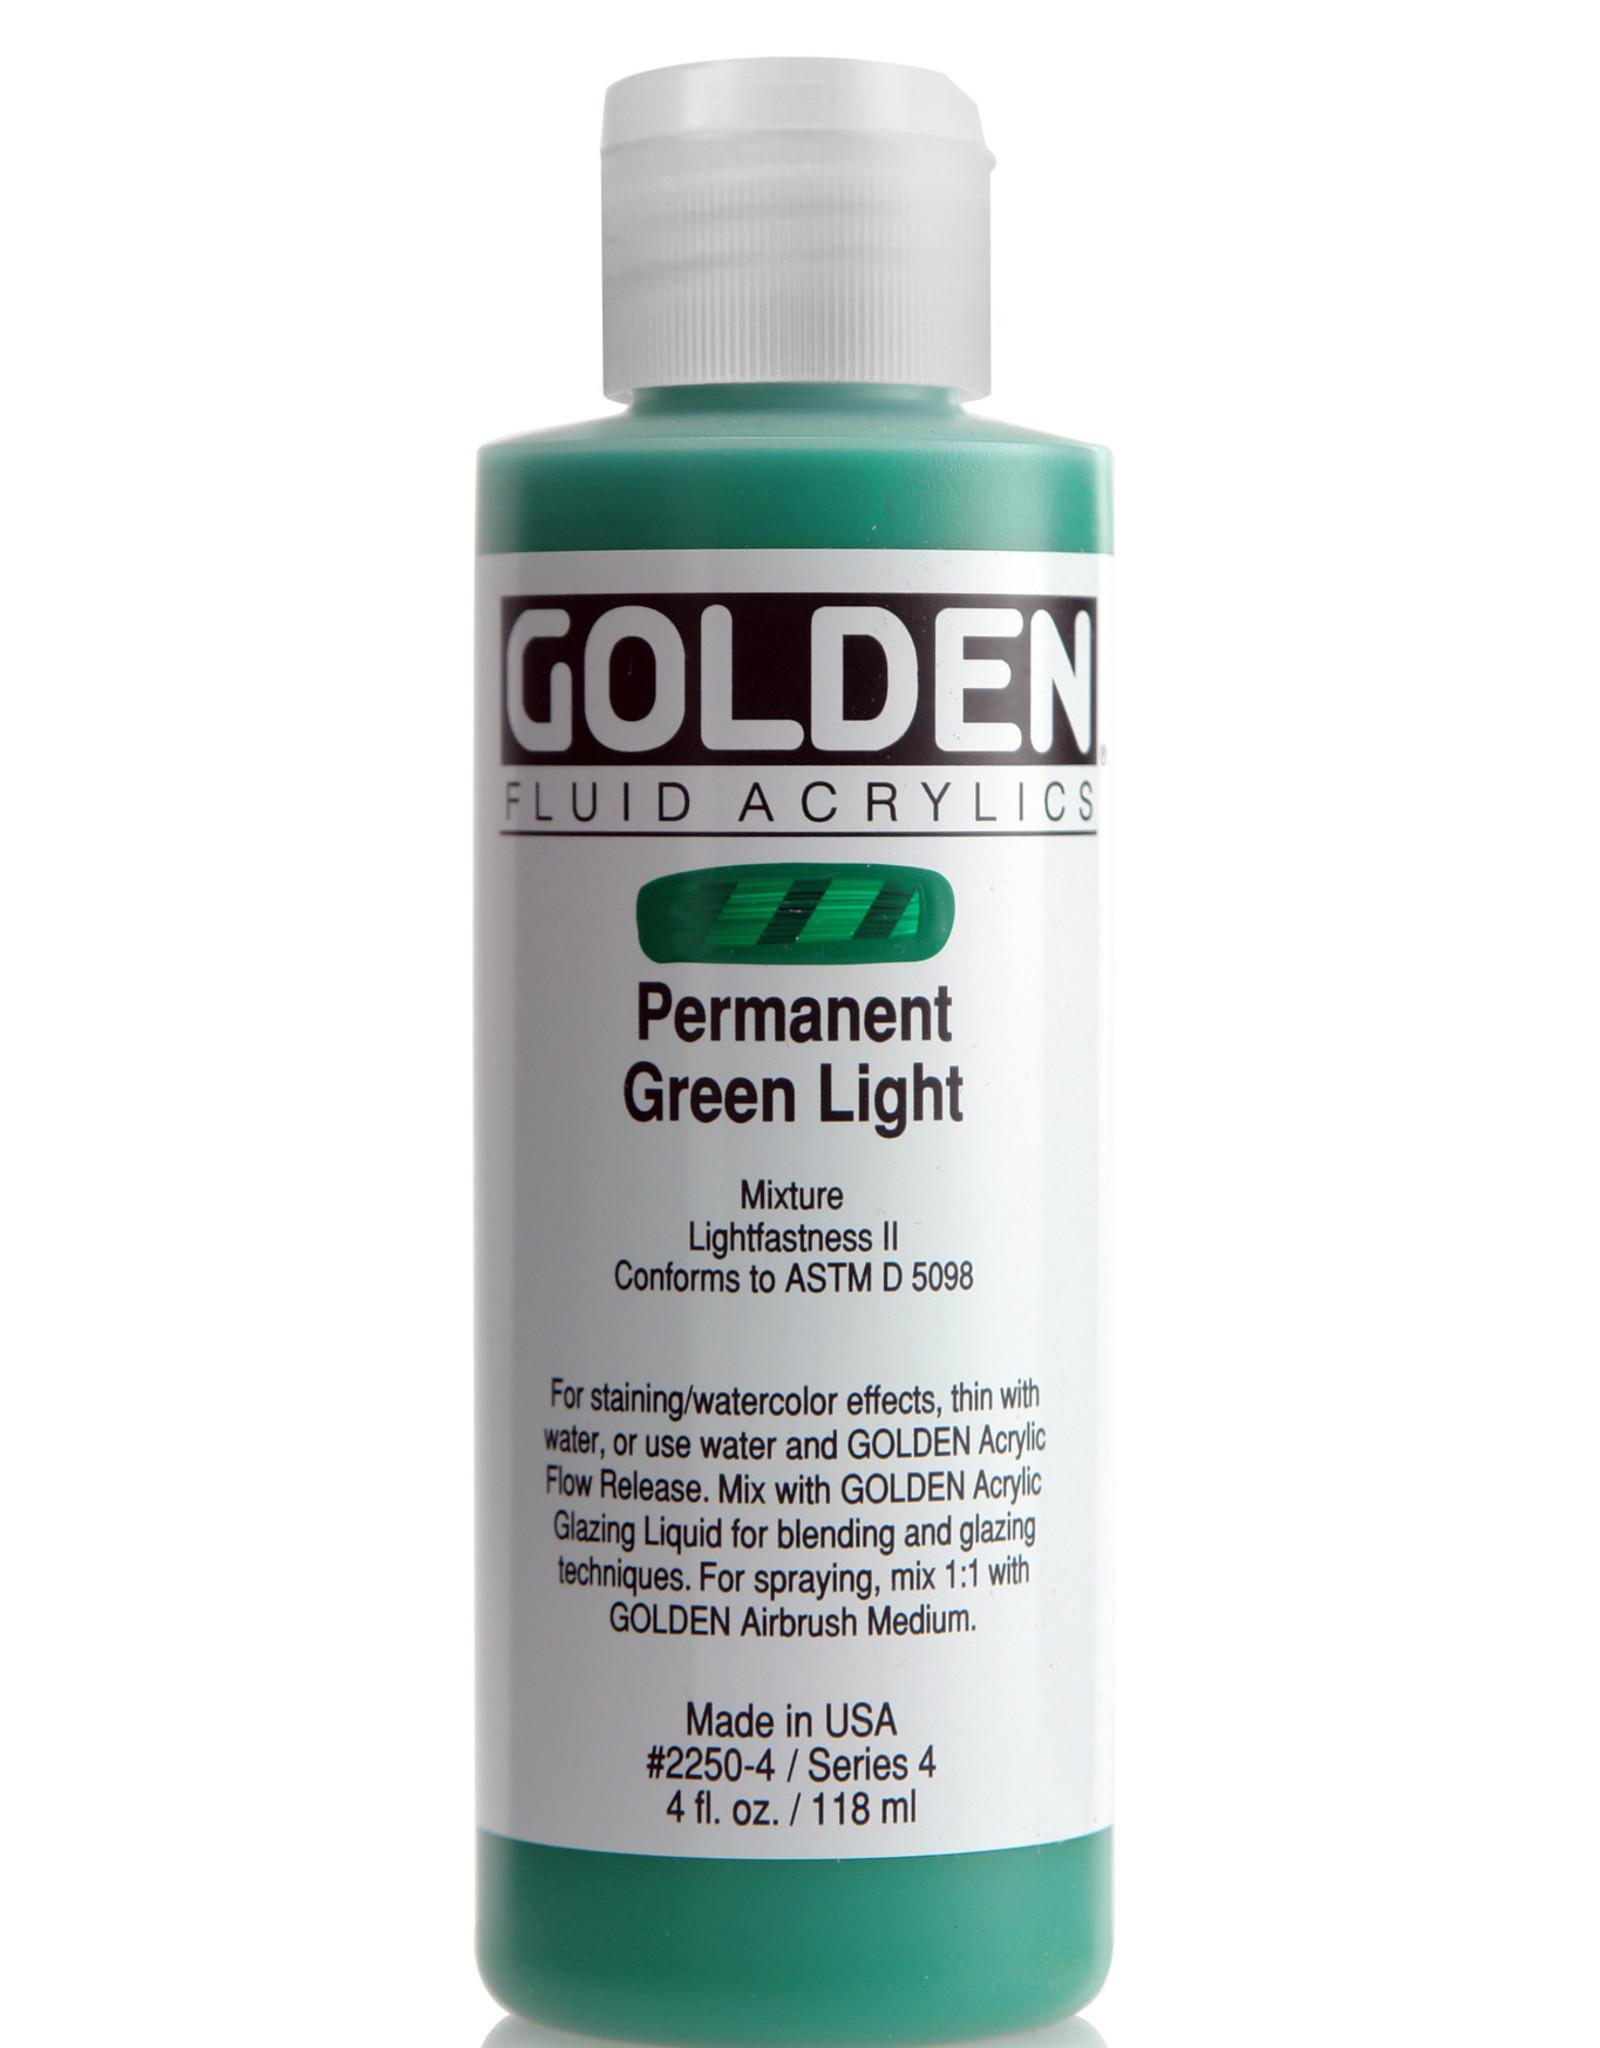 Golden Fluid Acrylic Paint, Permanent Green Light, Series 4, 4fl.oz, Bottle